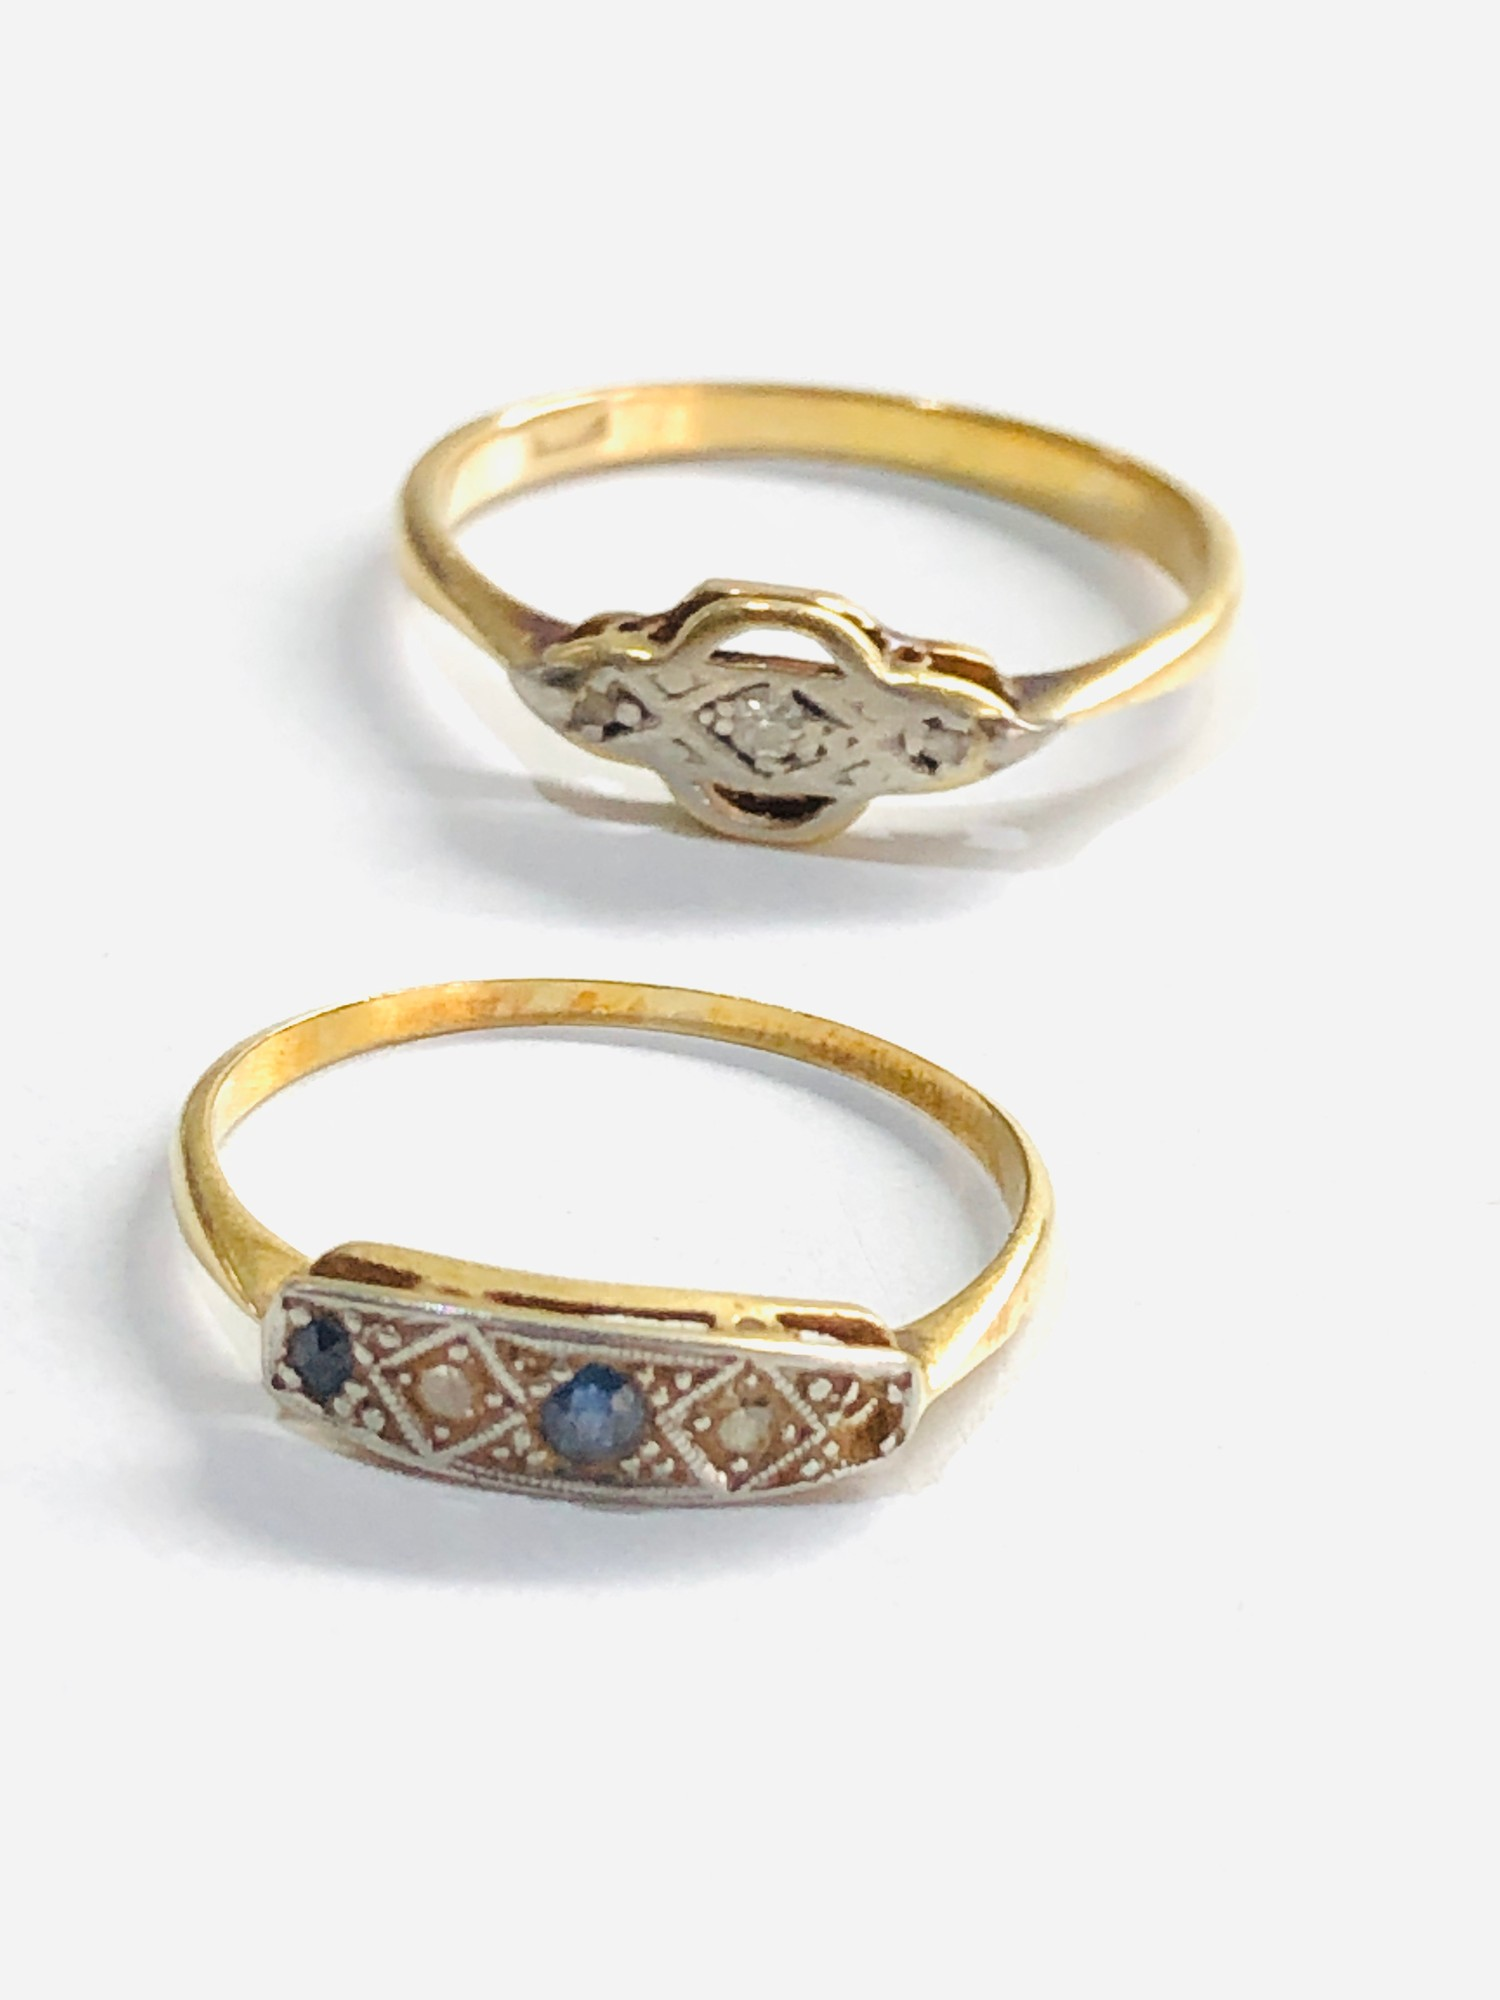 2 x 18ct gold diamond detail rings missing stone 3.2g